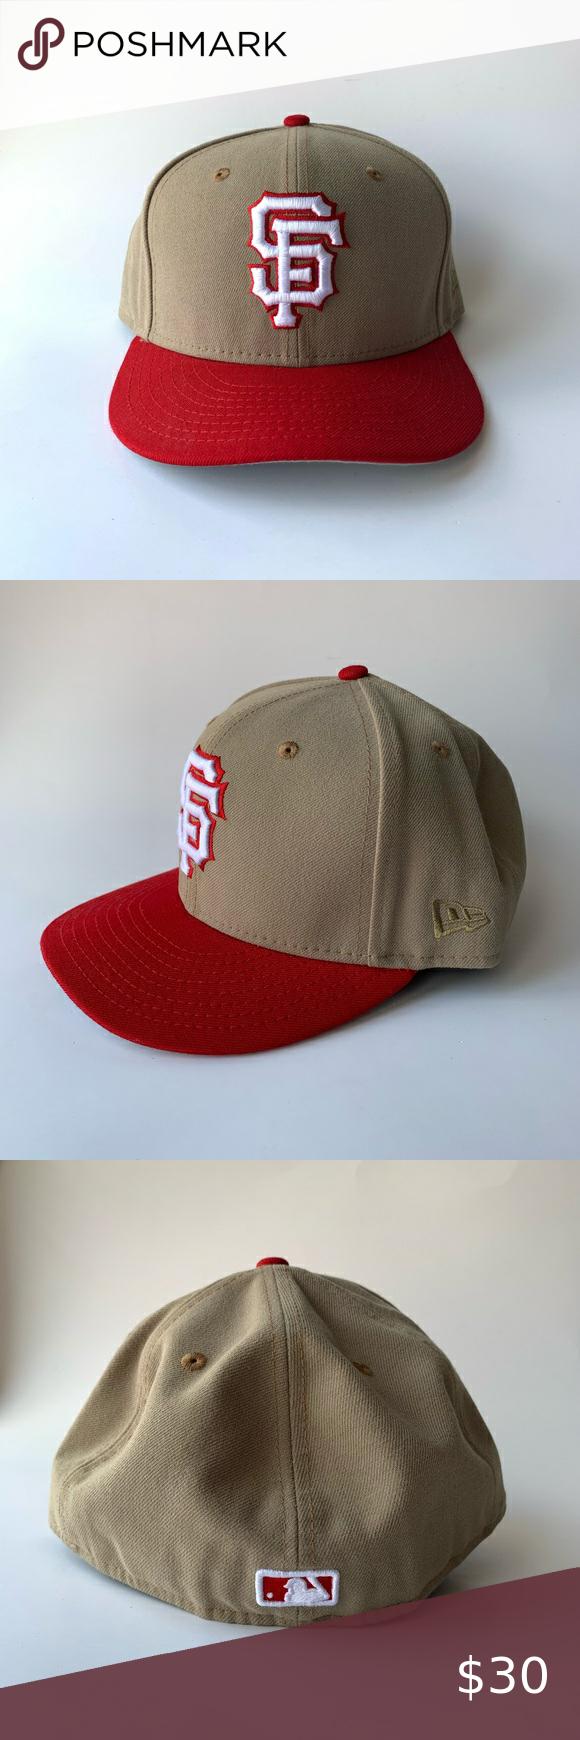 San Francisco Giants X 49ers Hat Club New Era 5950 Hat Club Exclusive New Era San Francisco Giants Hat With The 49ers New Era San Francisco Giants 49ers Colors